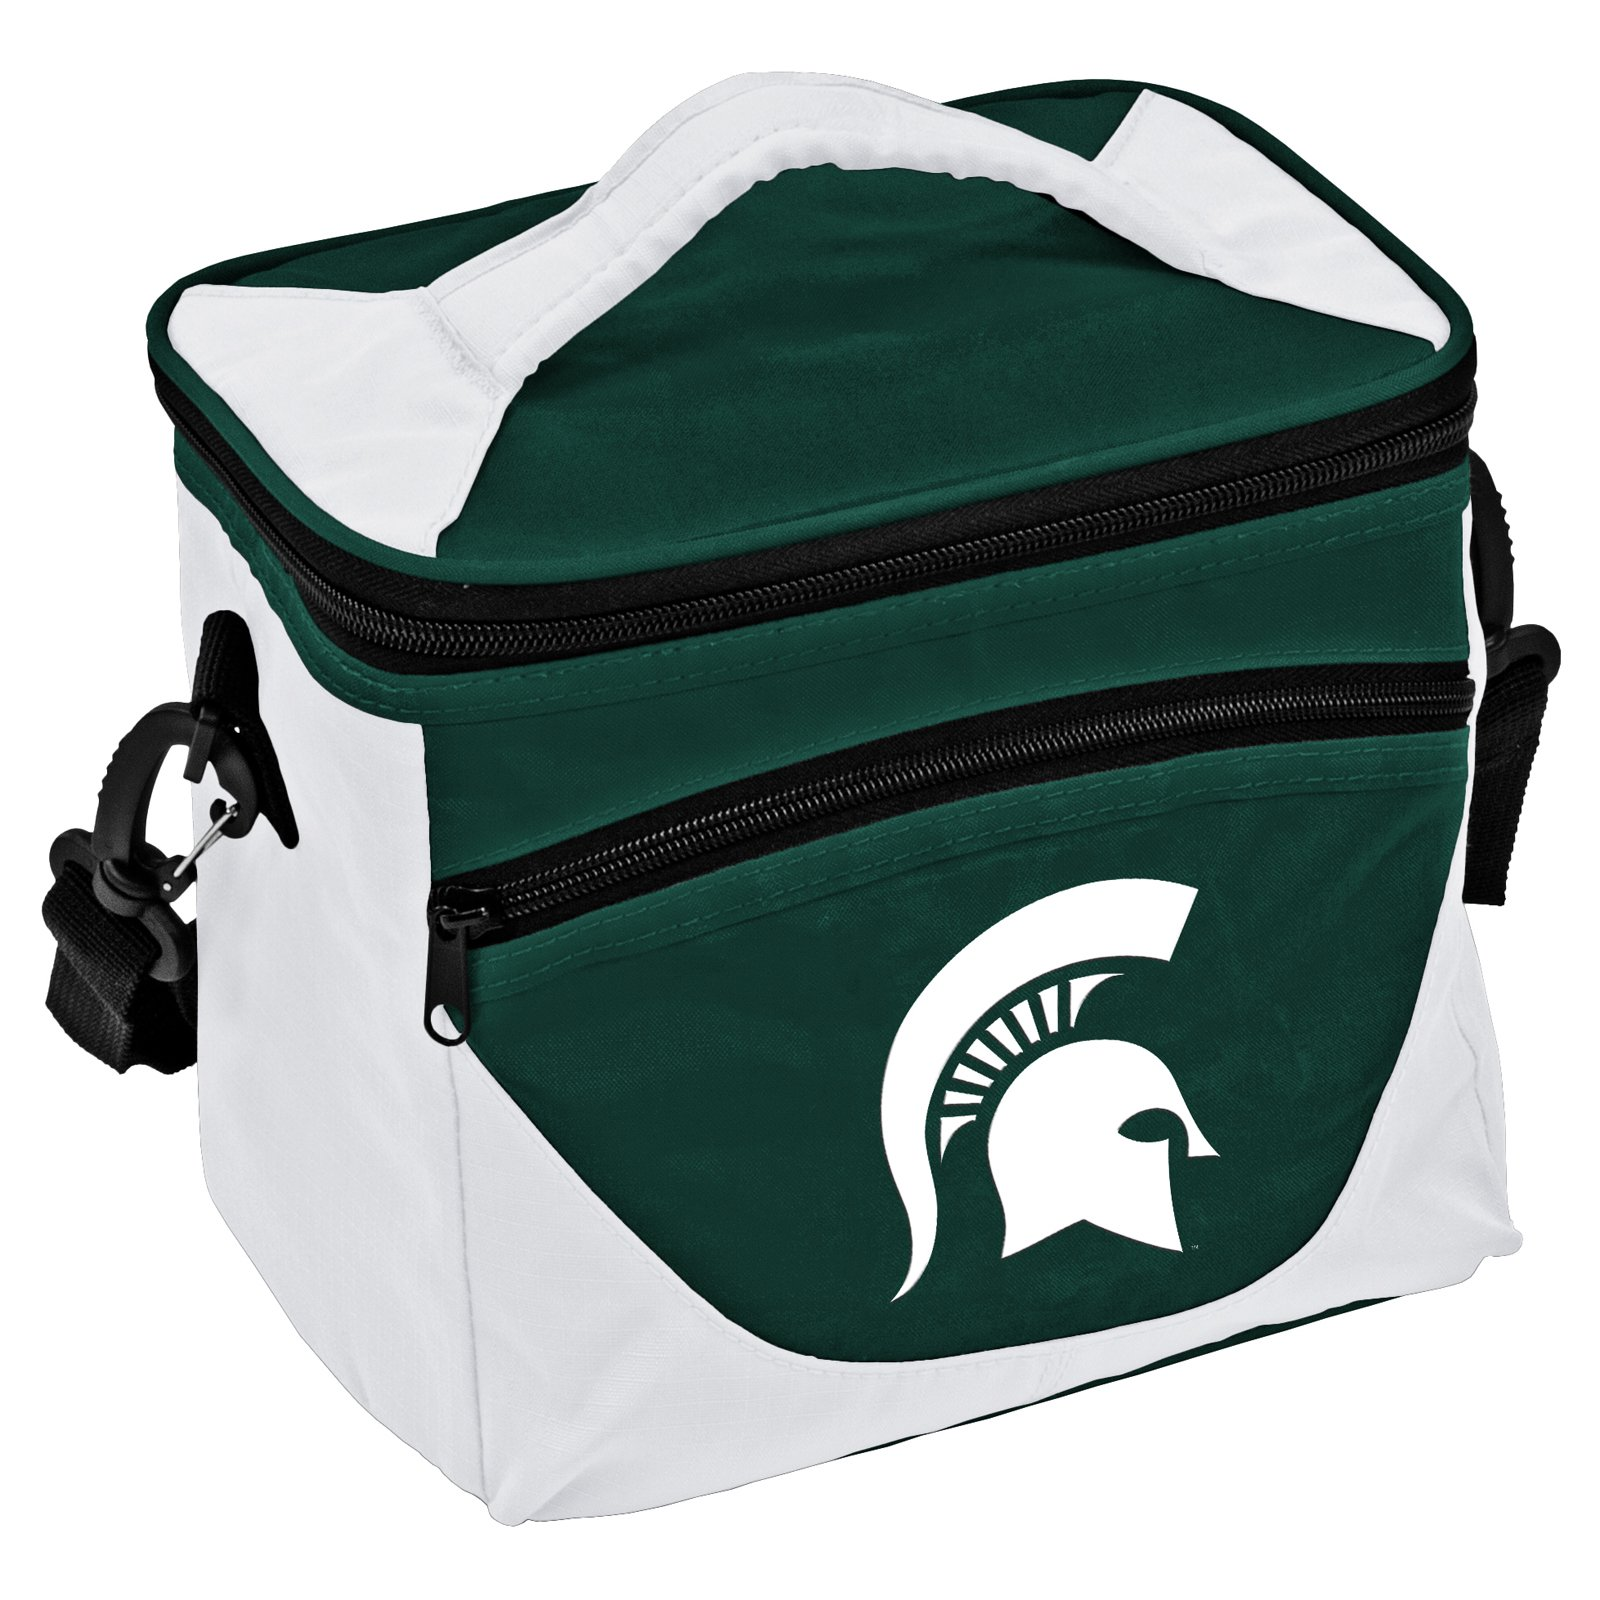 MI State Spartans Halftime Lunch Cooler